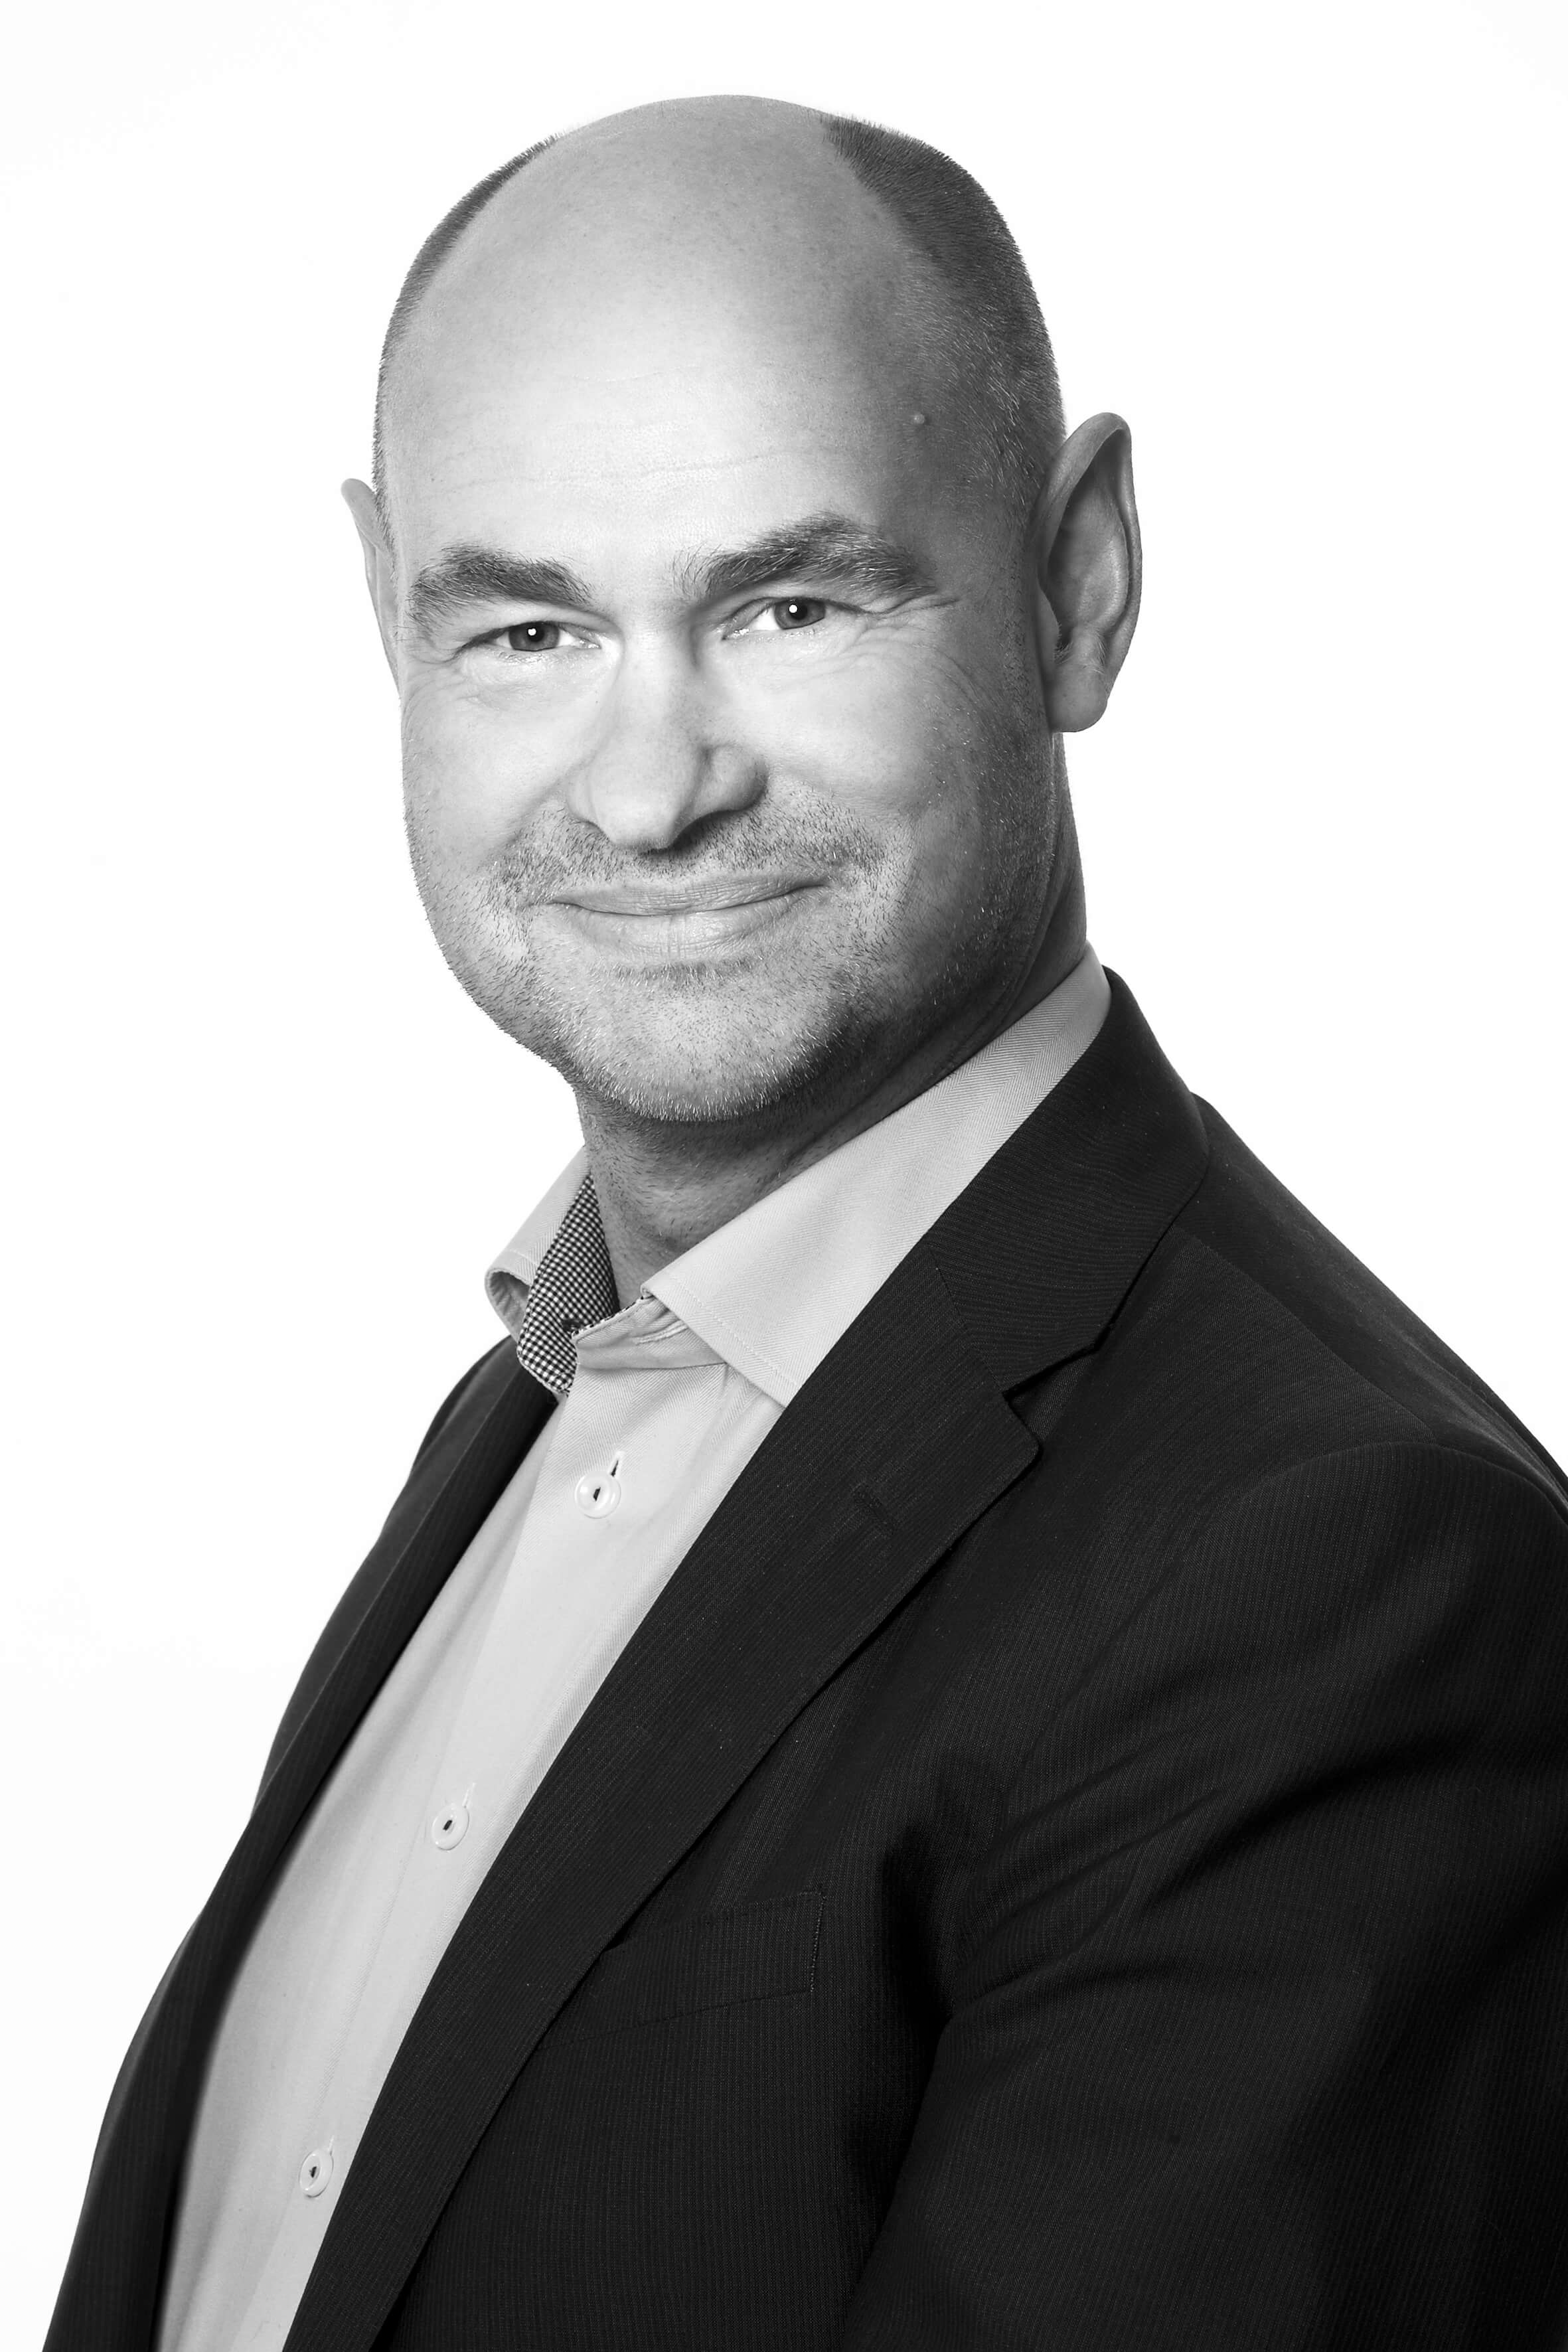 Hans Norderud, DNB Næringsmegling Tronheim